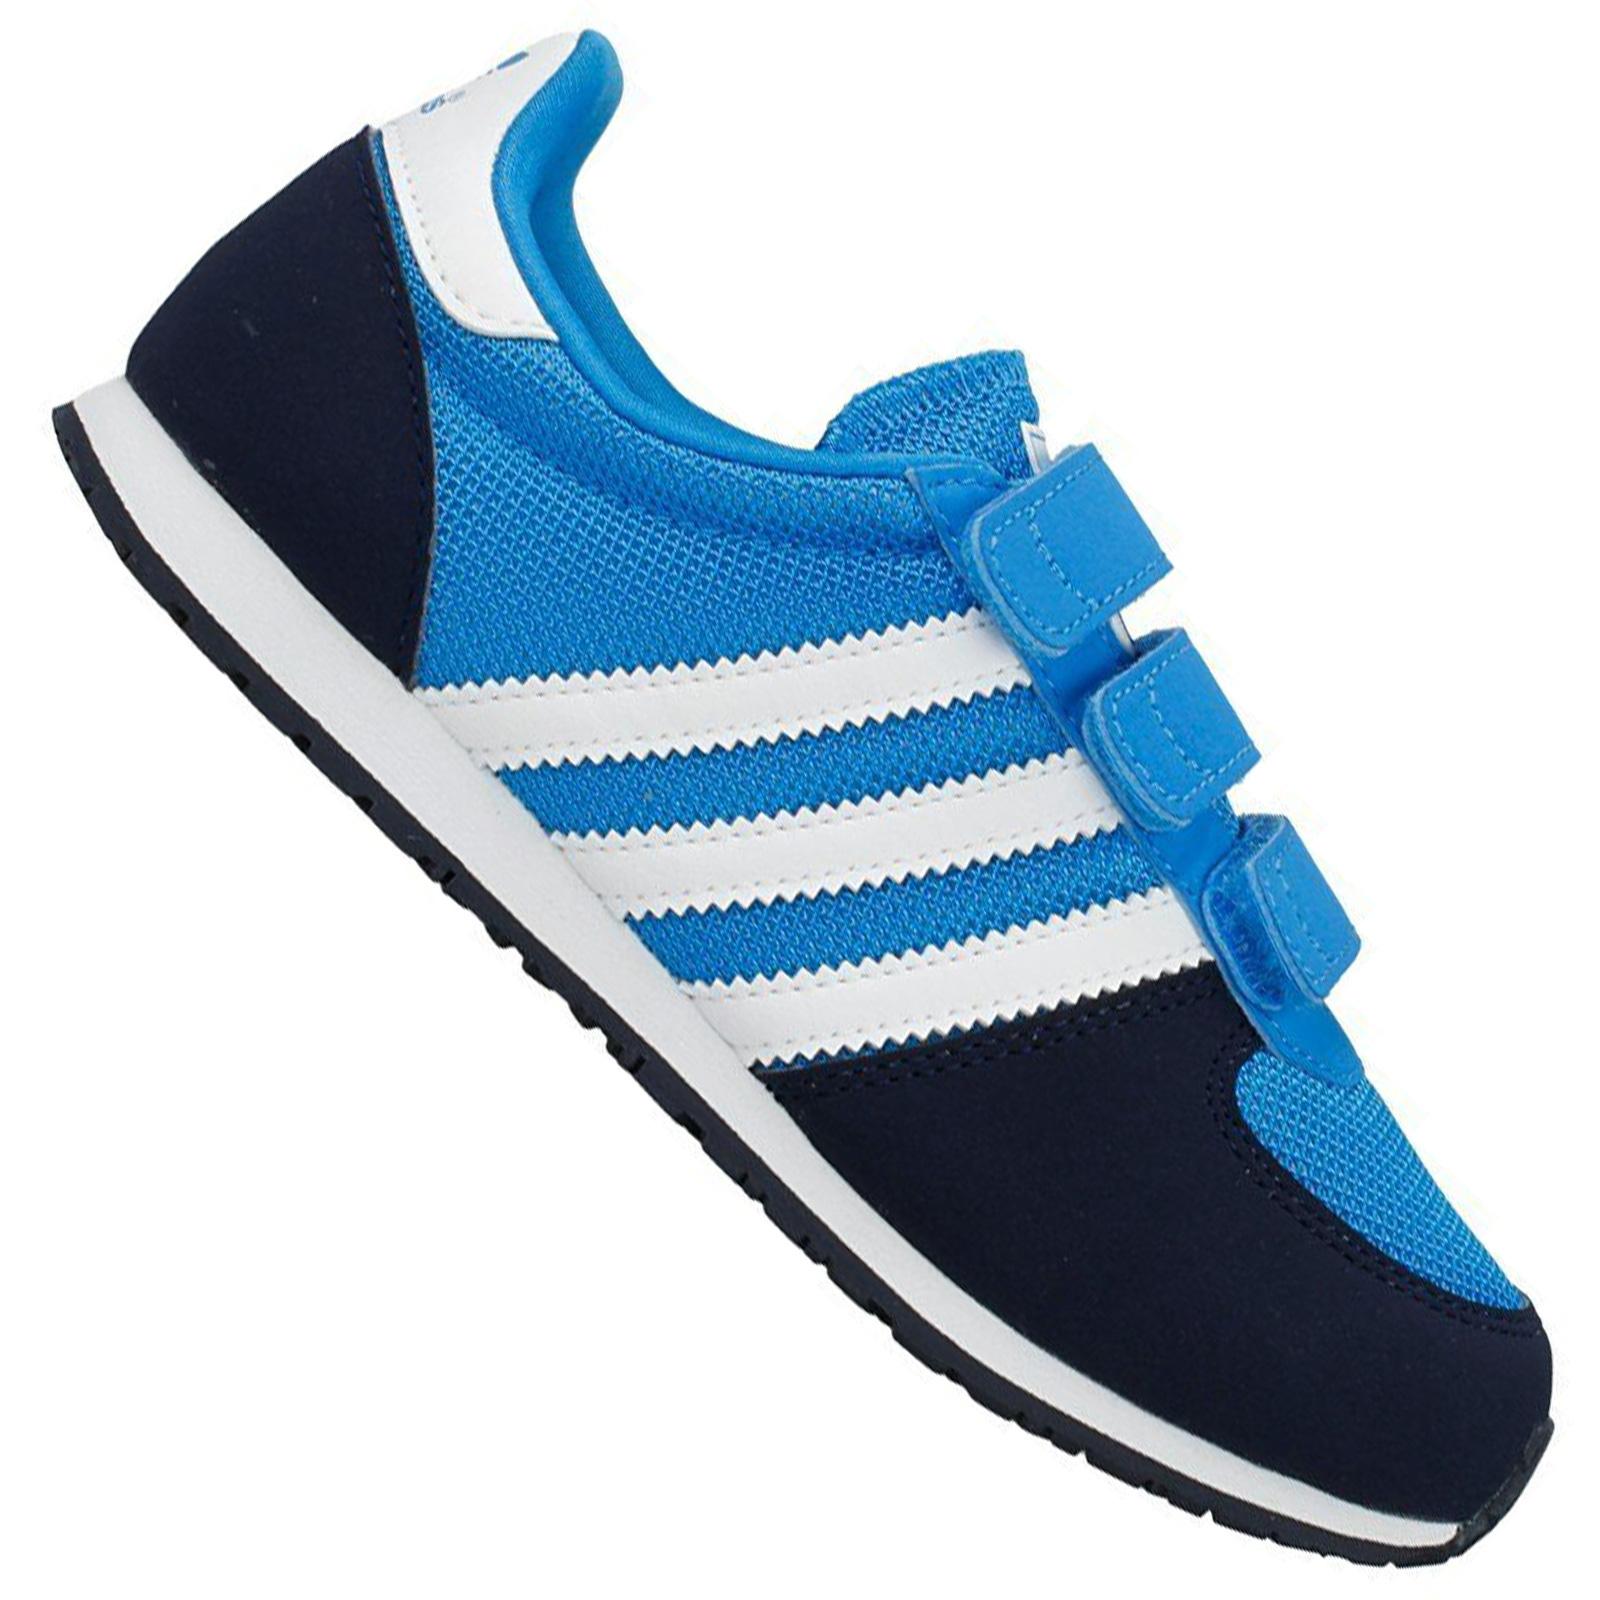 Sneaker Dragon M17117 Blau Adistar Racer Kinder Adidas Schuhe Originals wvN8nOm0